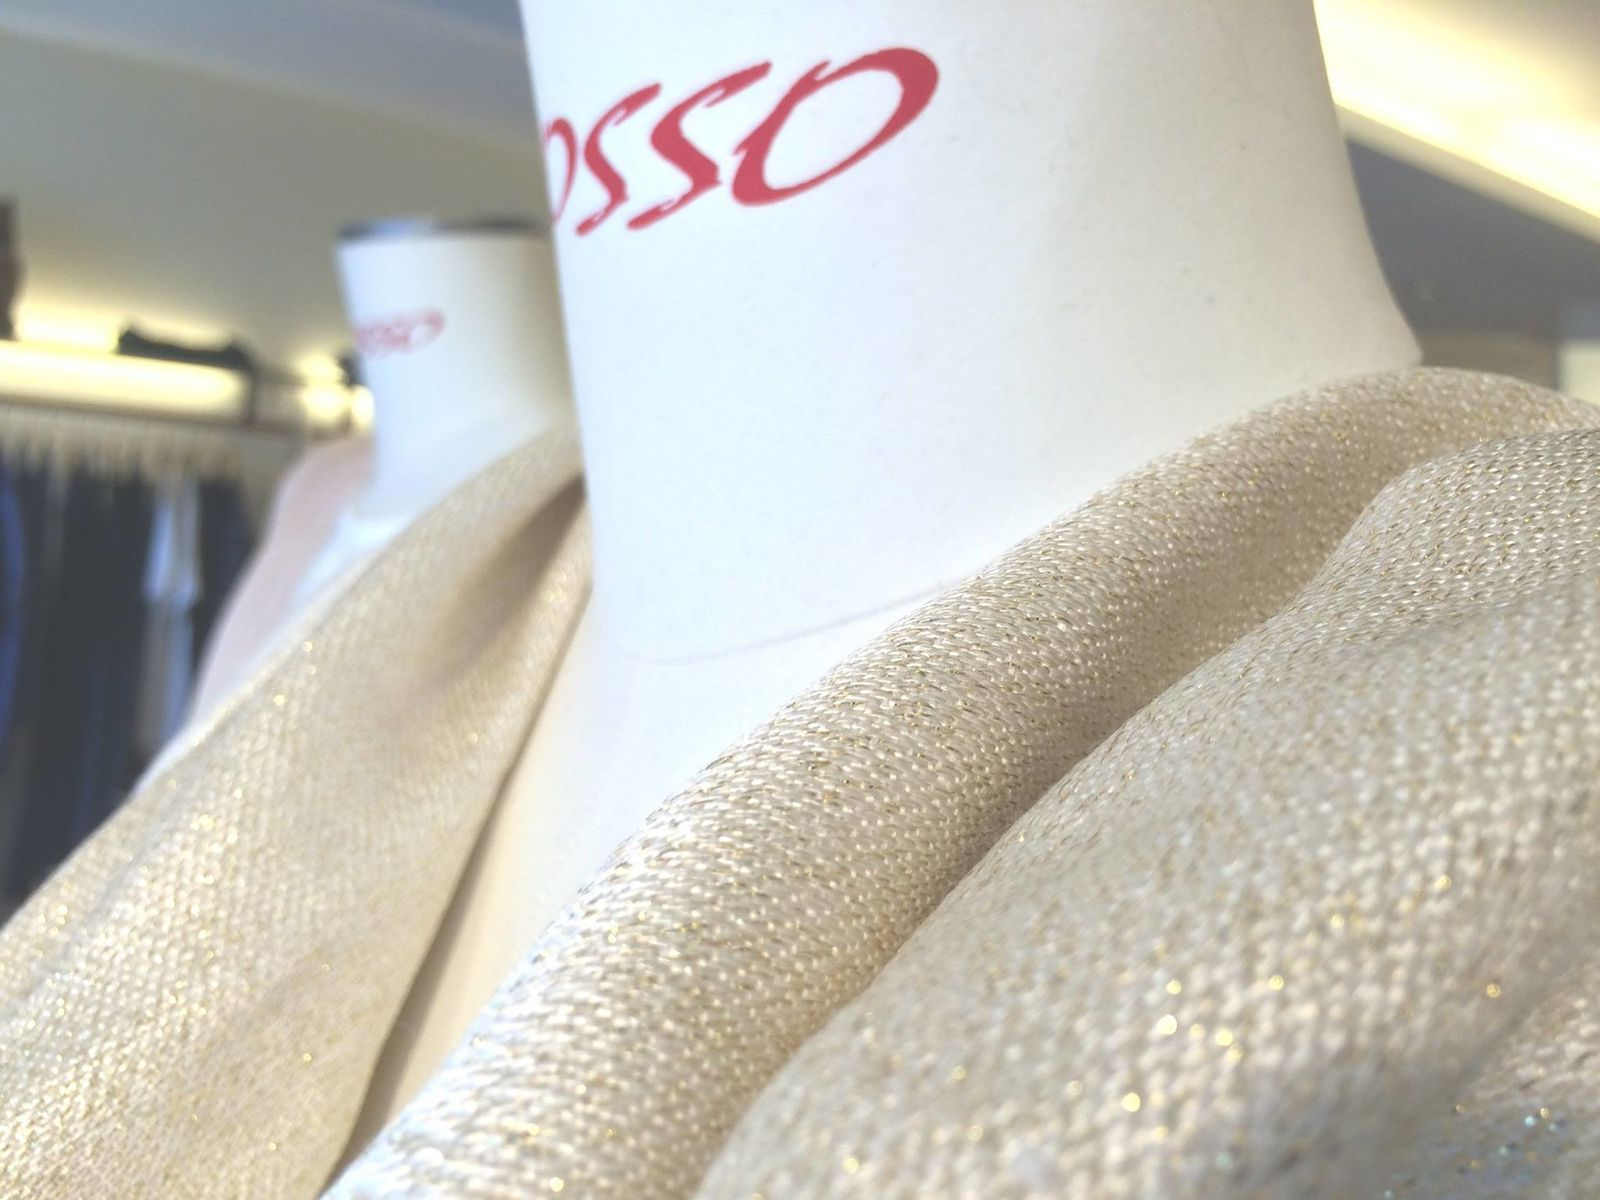 ROSSO Mode & Schuhe Prien am Chiemsee in Prien (Bild 13)